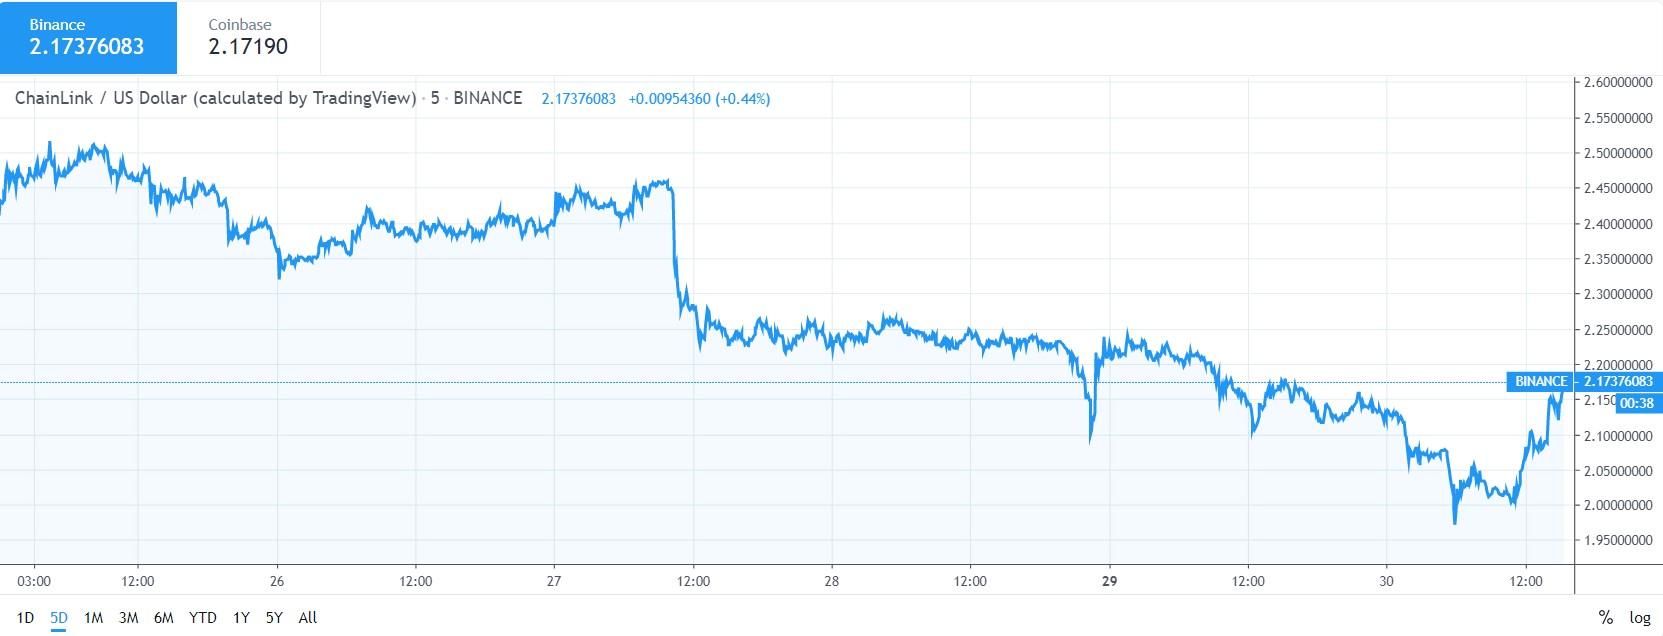 Chainlink price analysis: sentiment bearish despite breakout